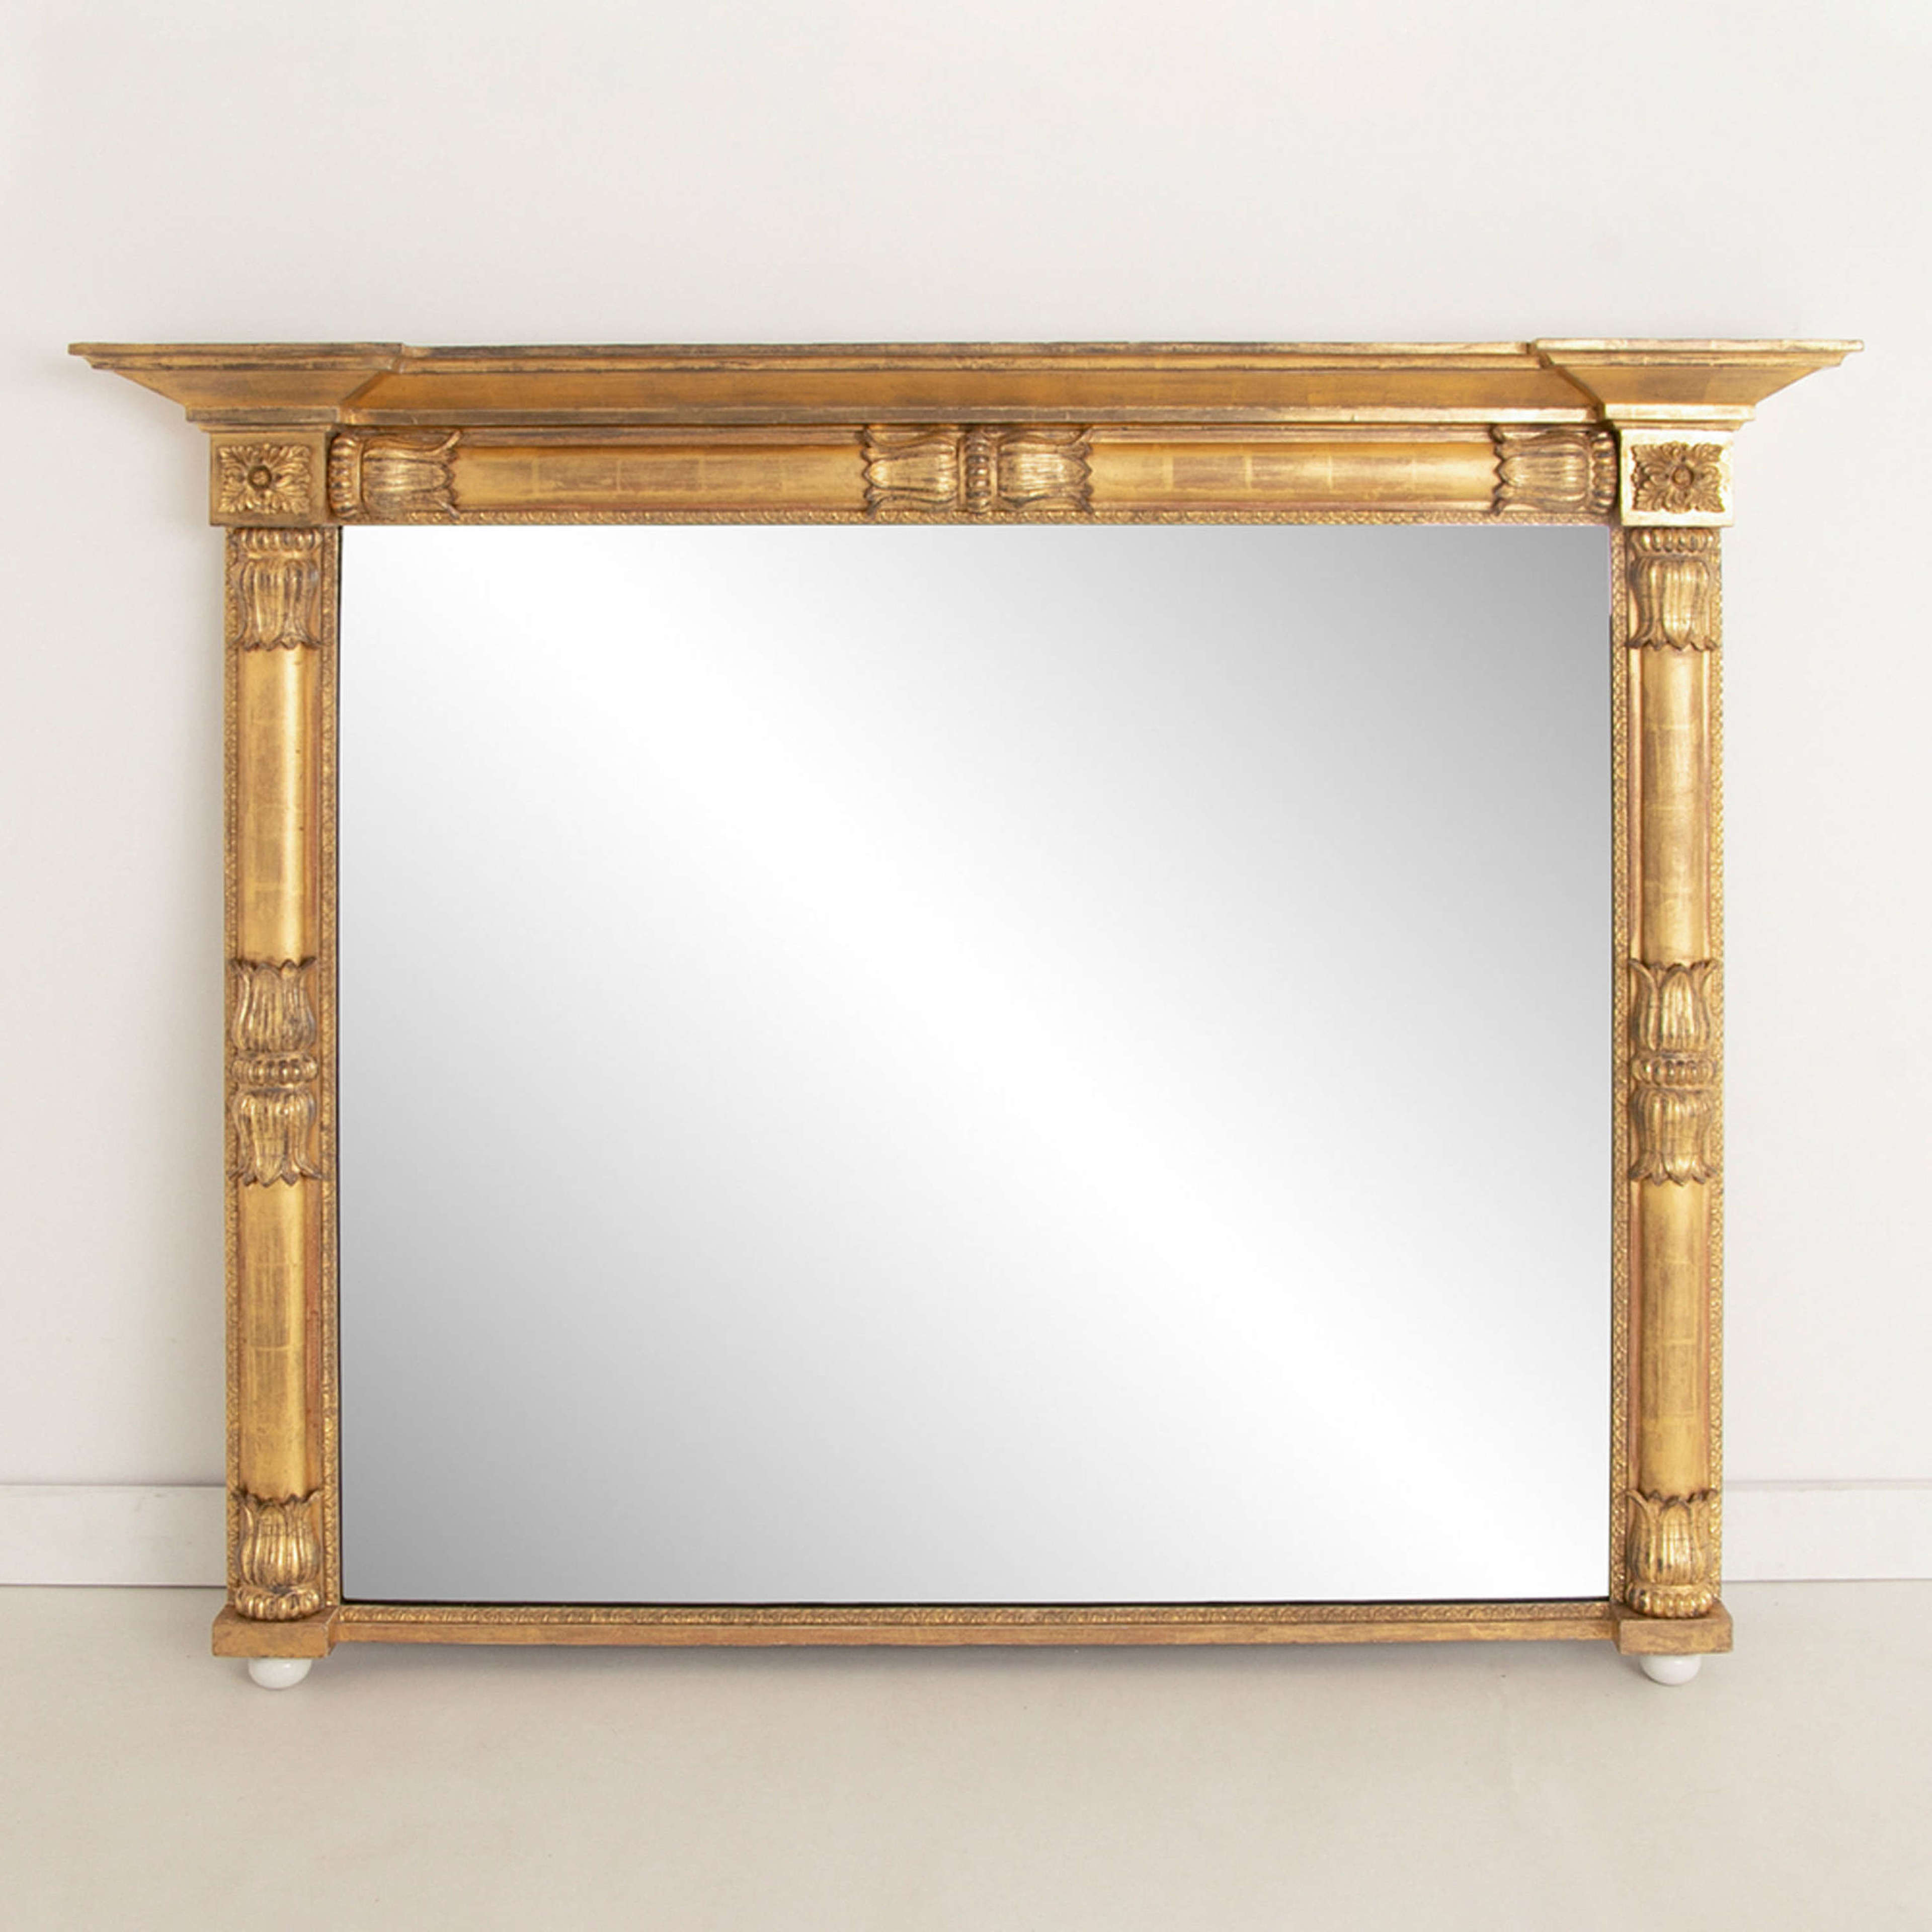 Antique Irish Water Gilded Overmantle Mirror c.1820